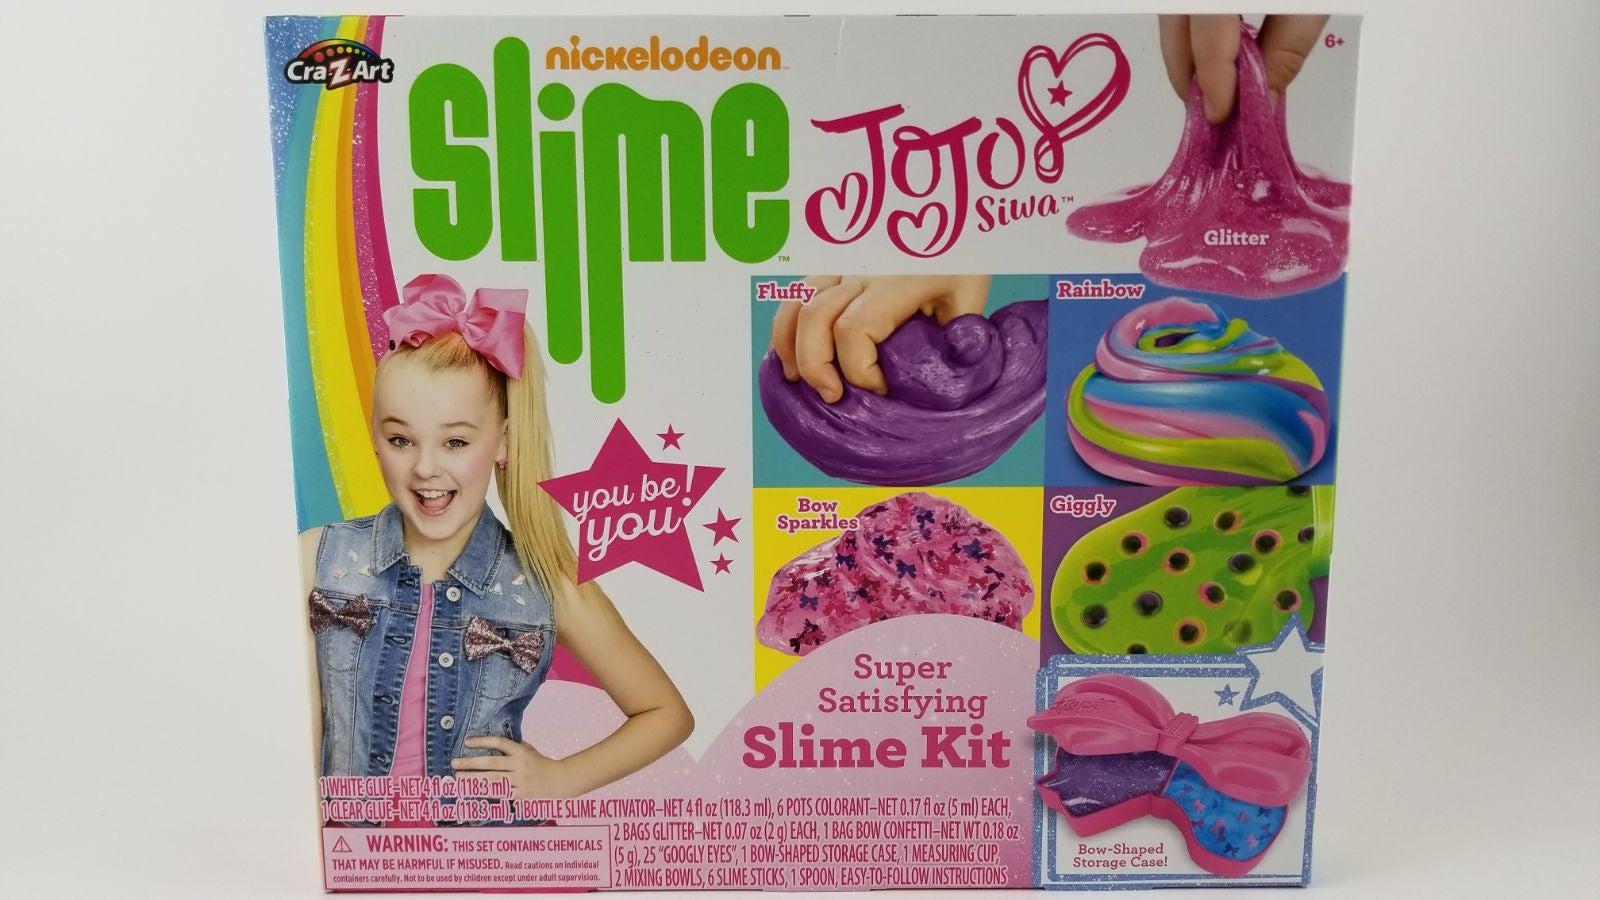 Nickelodeon Jojo Siwa Slime Kit